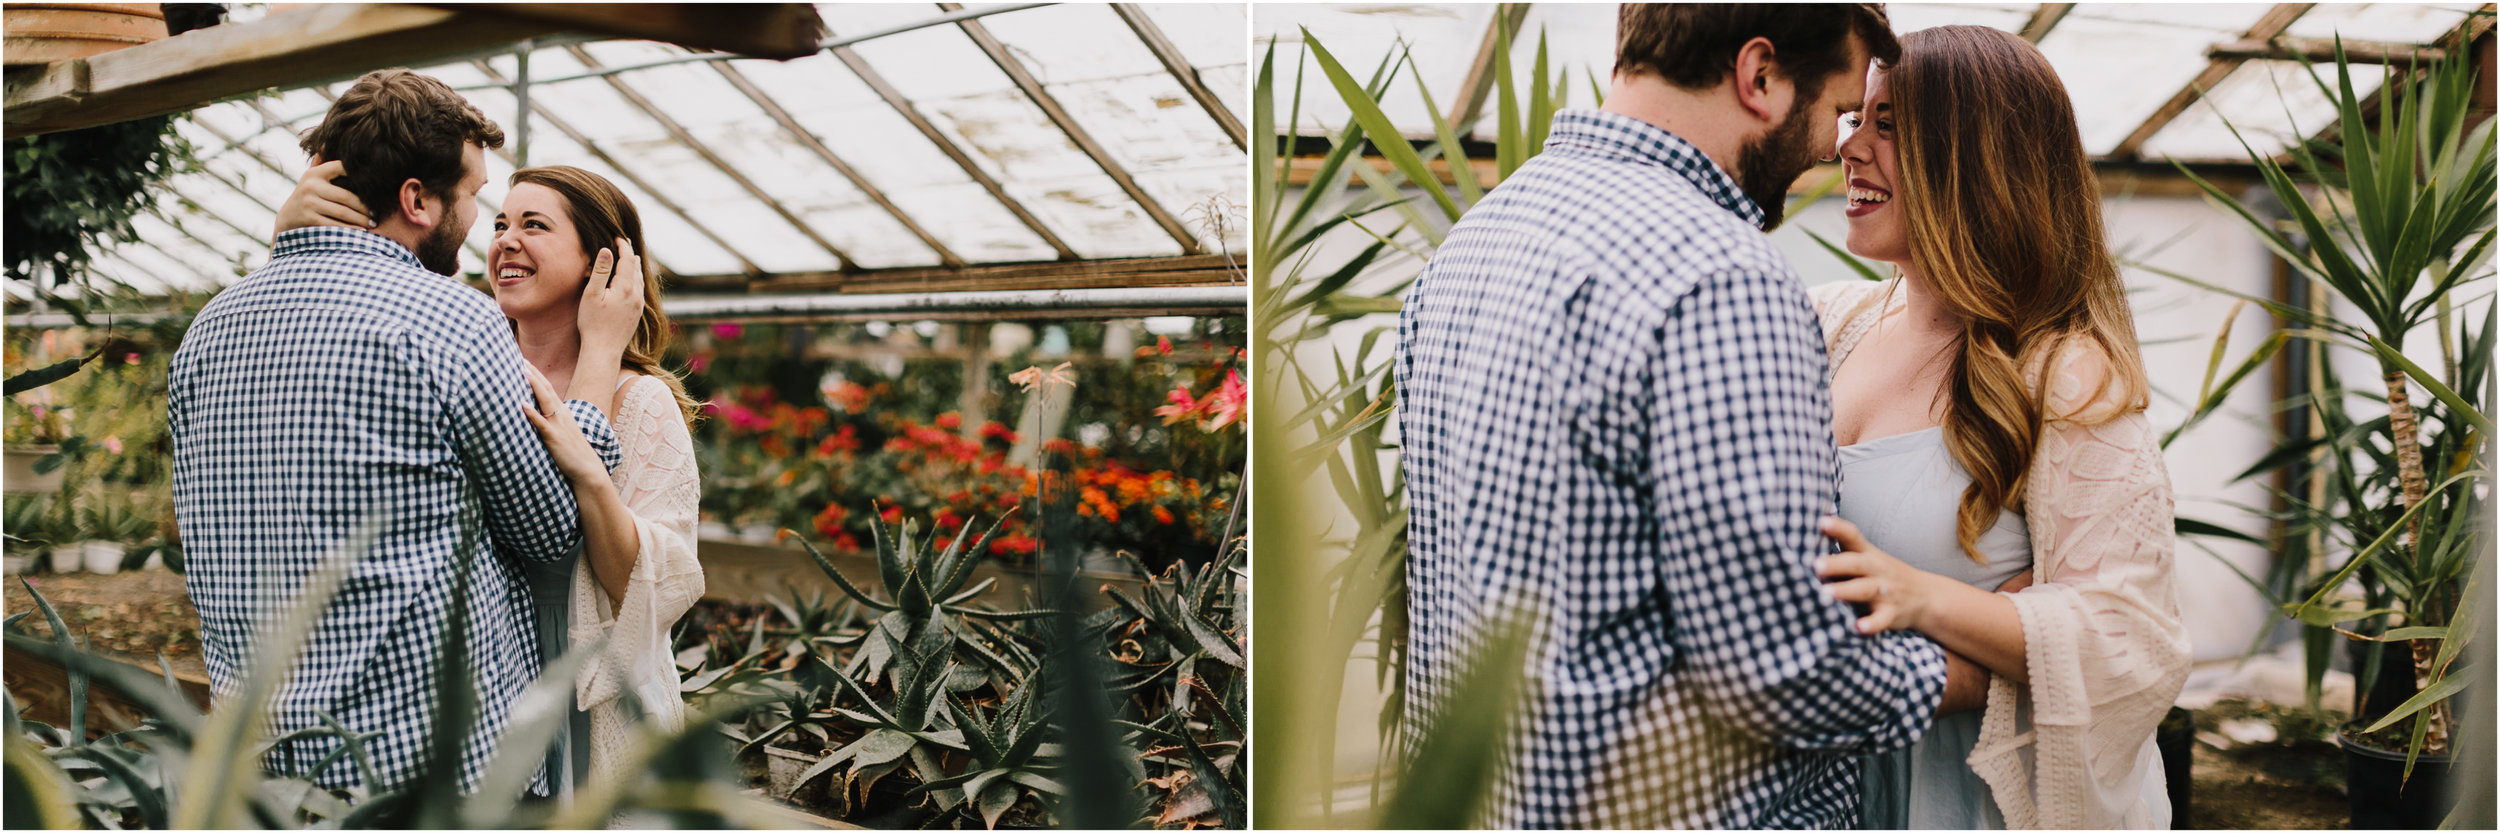 alyssa barletter photography greenhouse engagement photographer kansas city spring wedding-10.jpg